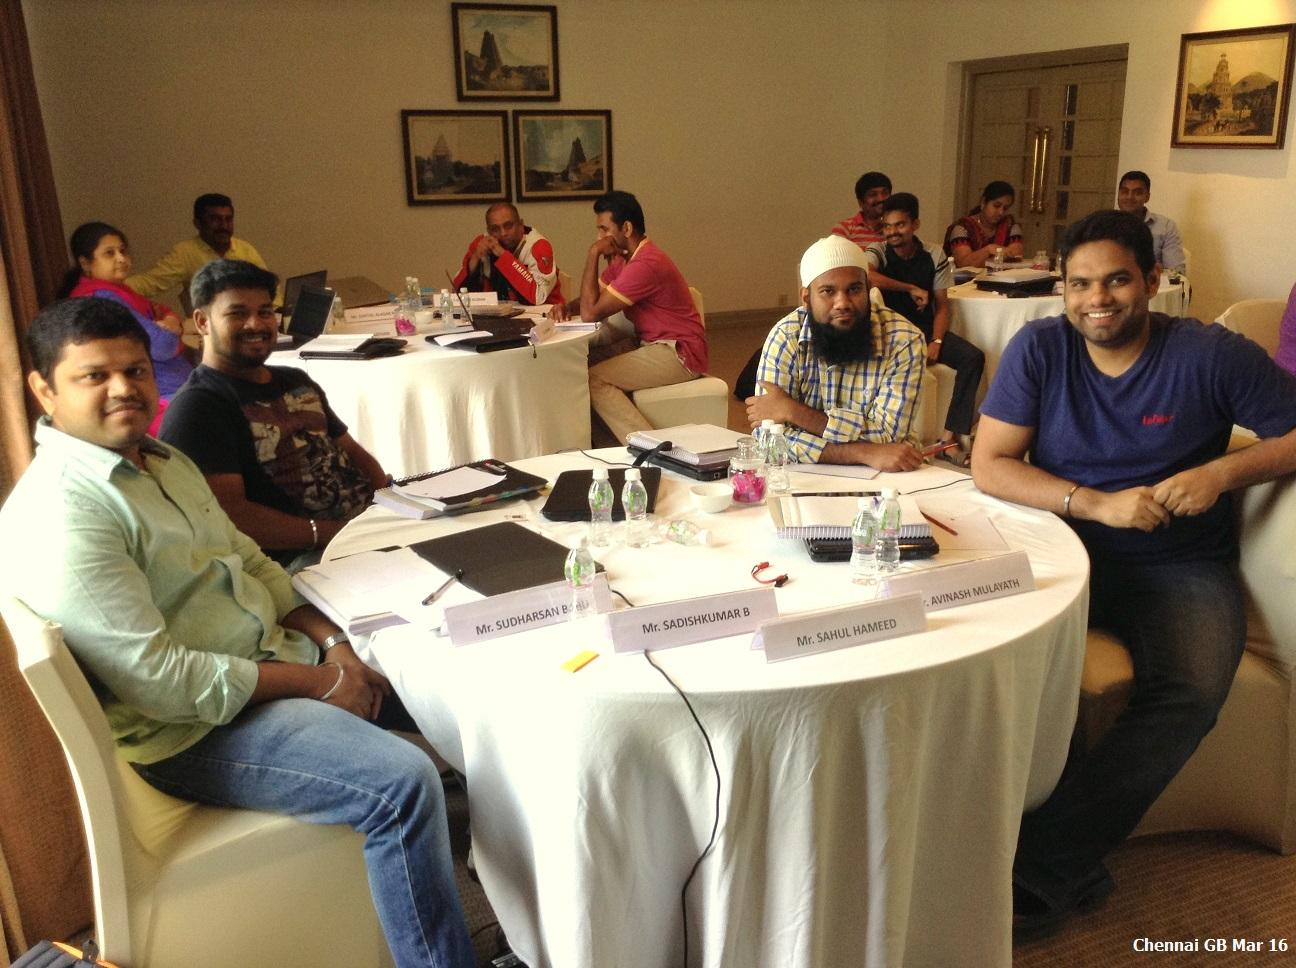 Chennai GB Mar 16 - Team Contest Winners